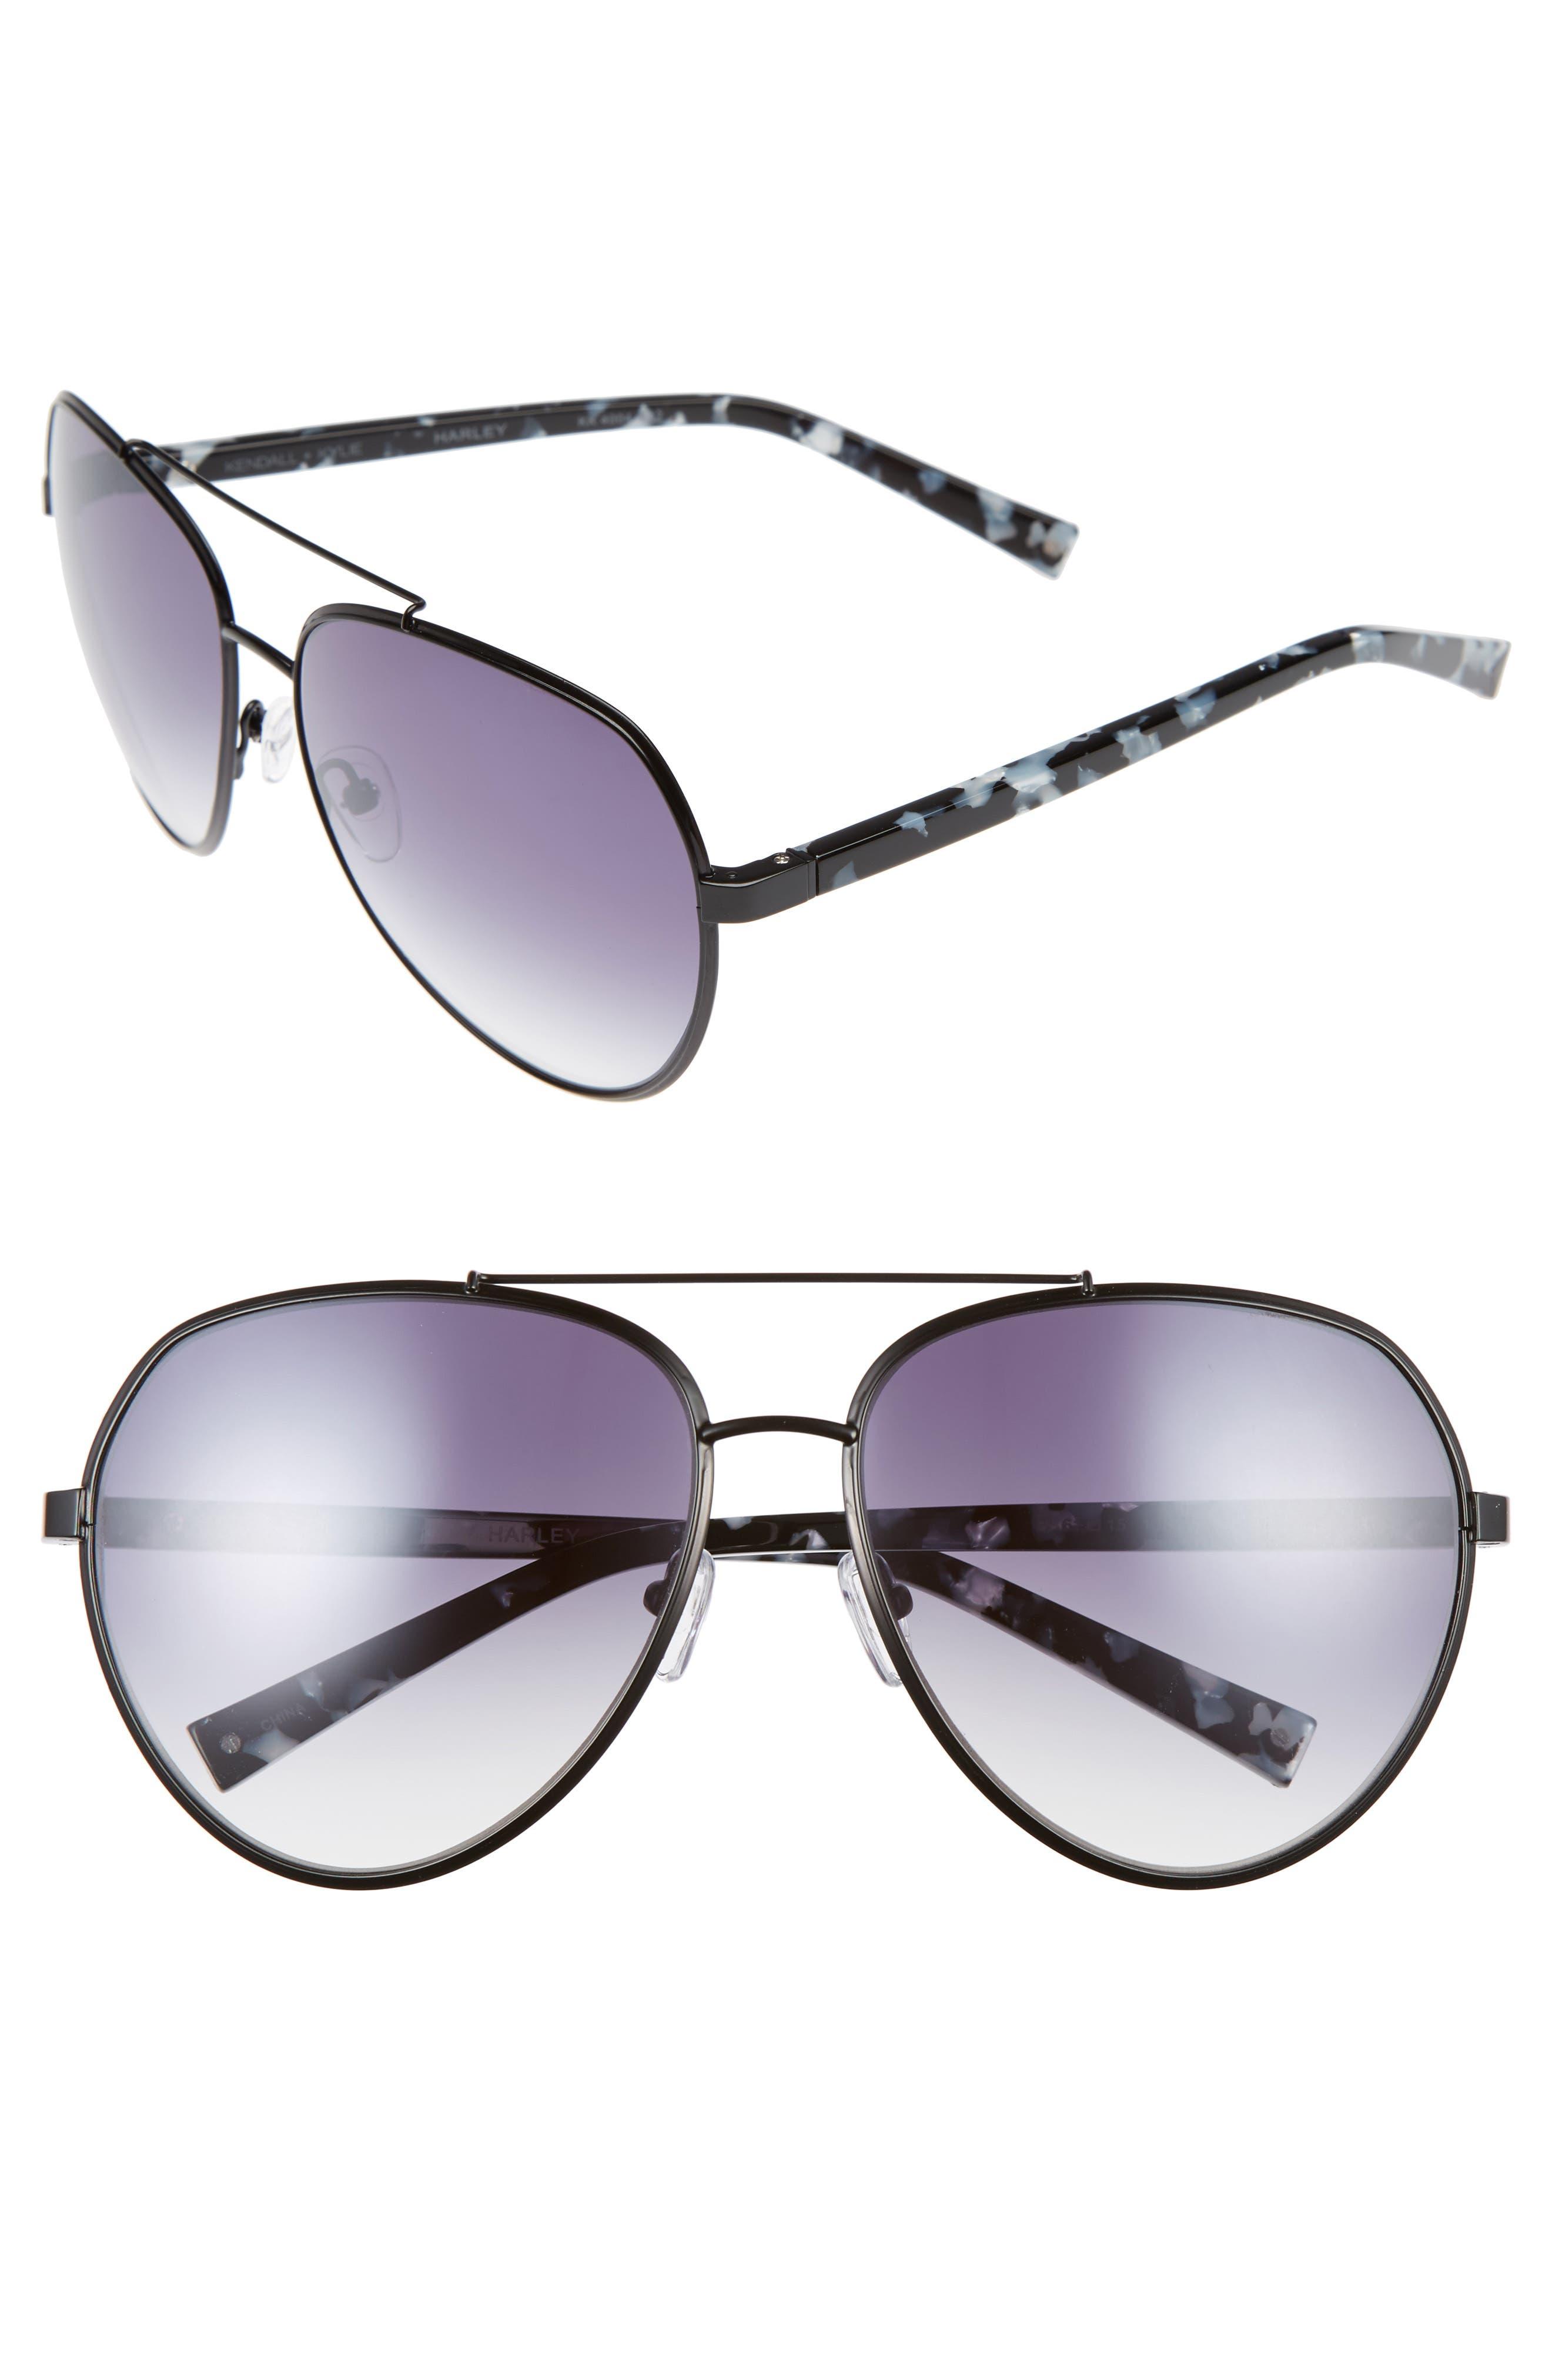 61mm Aviator Sunglasses,                             Main thumbnail 1, color,                             001